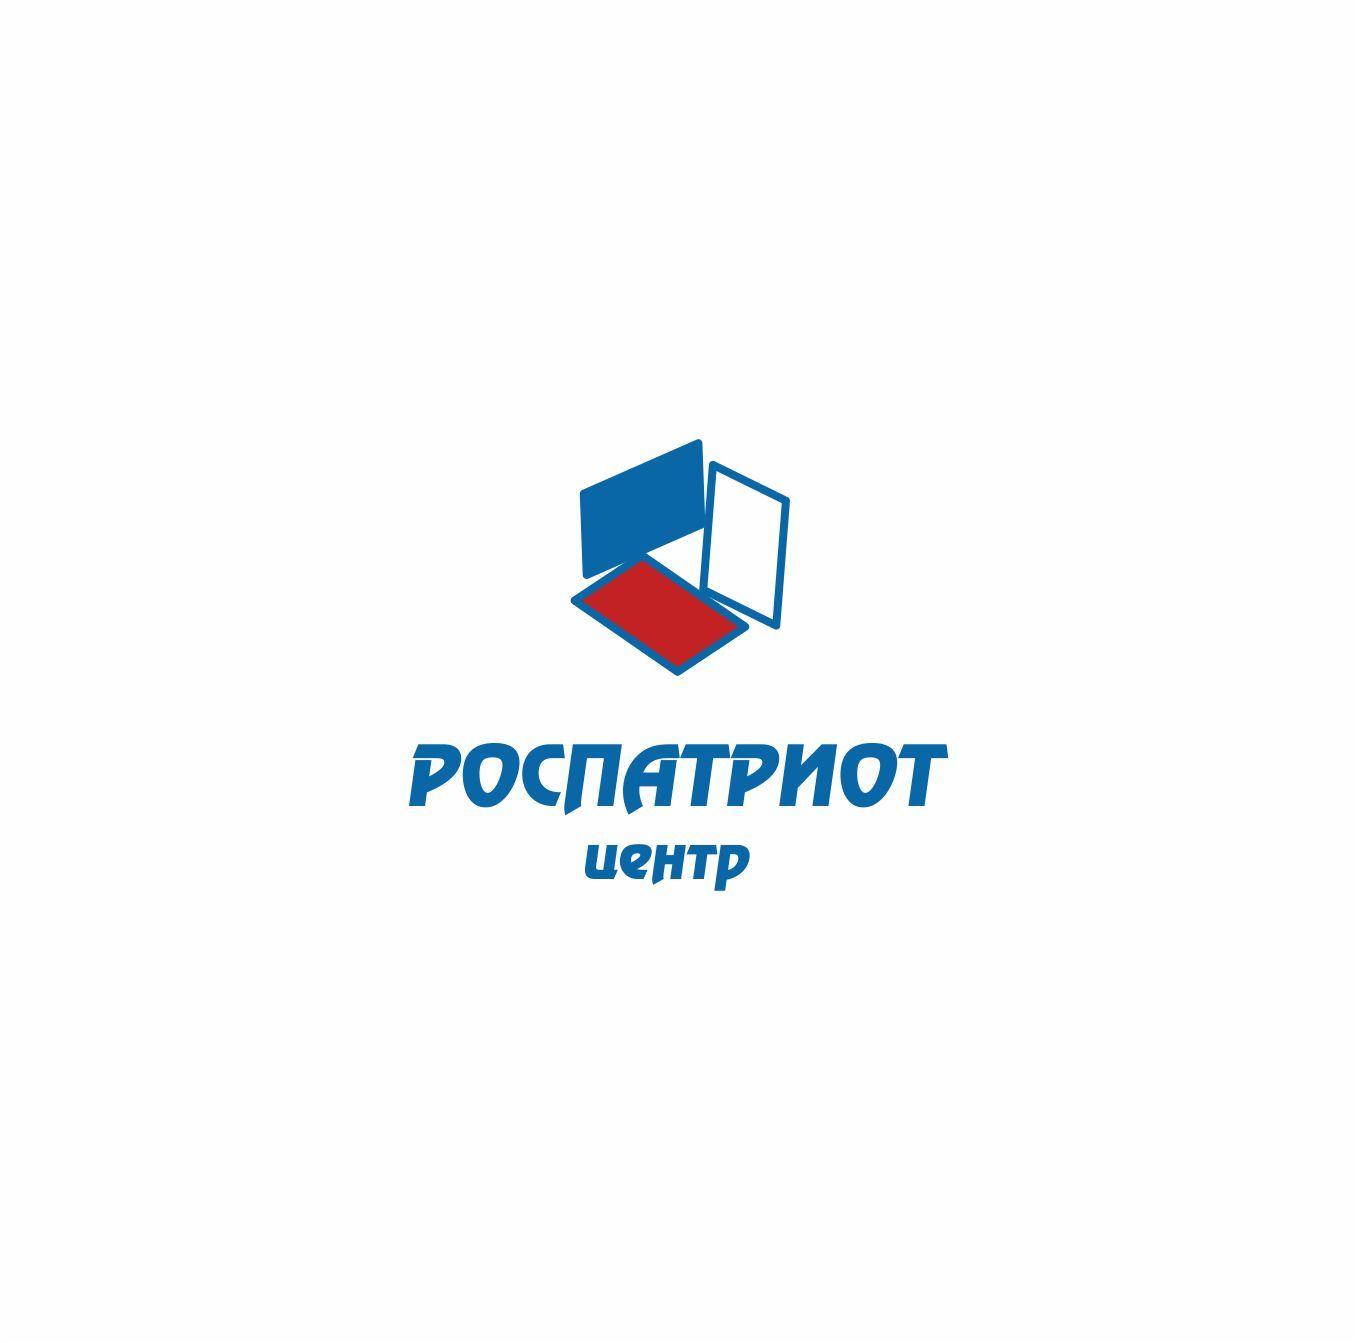 Логотип для роспатриотцентр - дизайнер dbyjuhfl